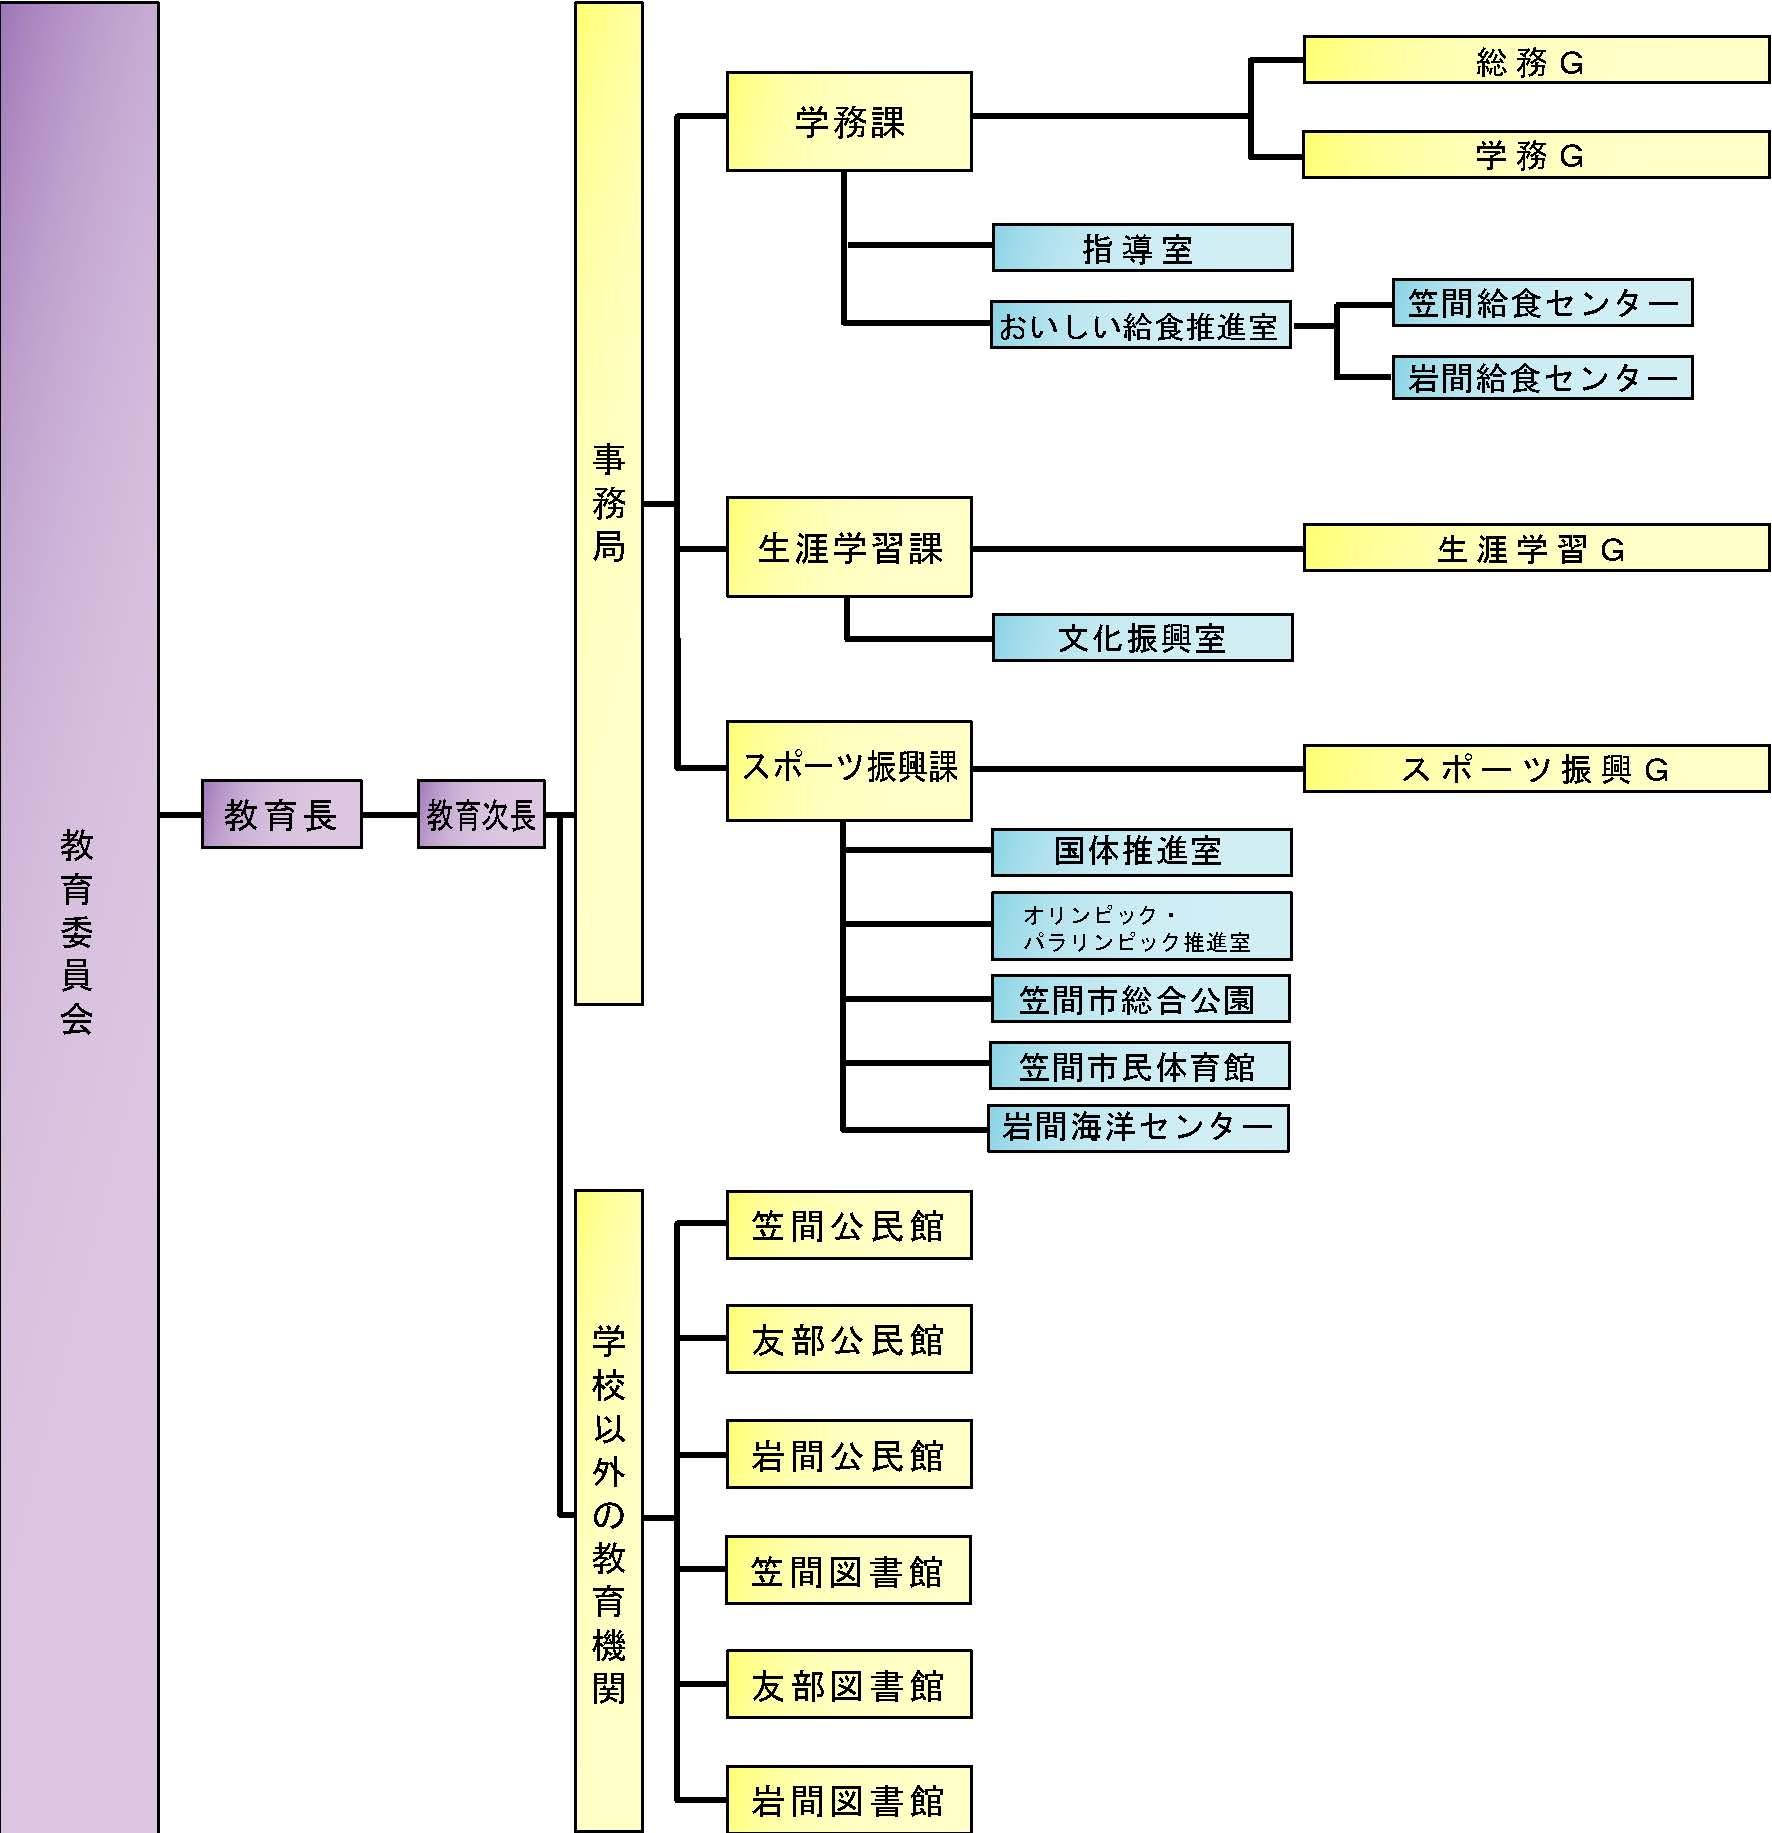 『H31教育委員会組織図』の画像